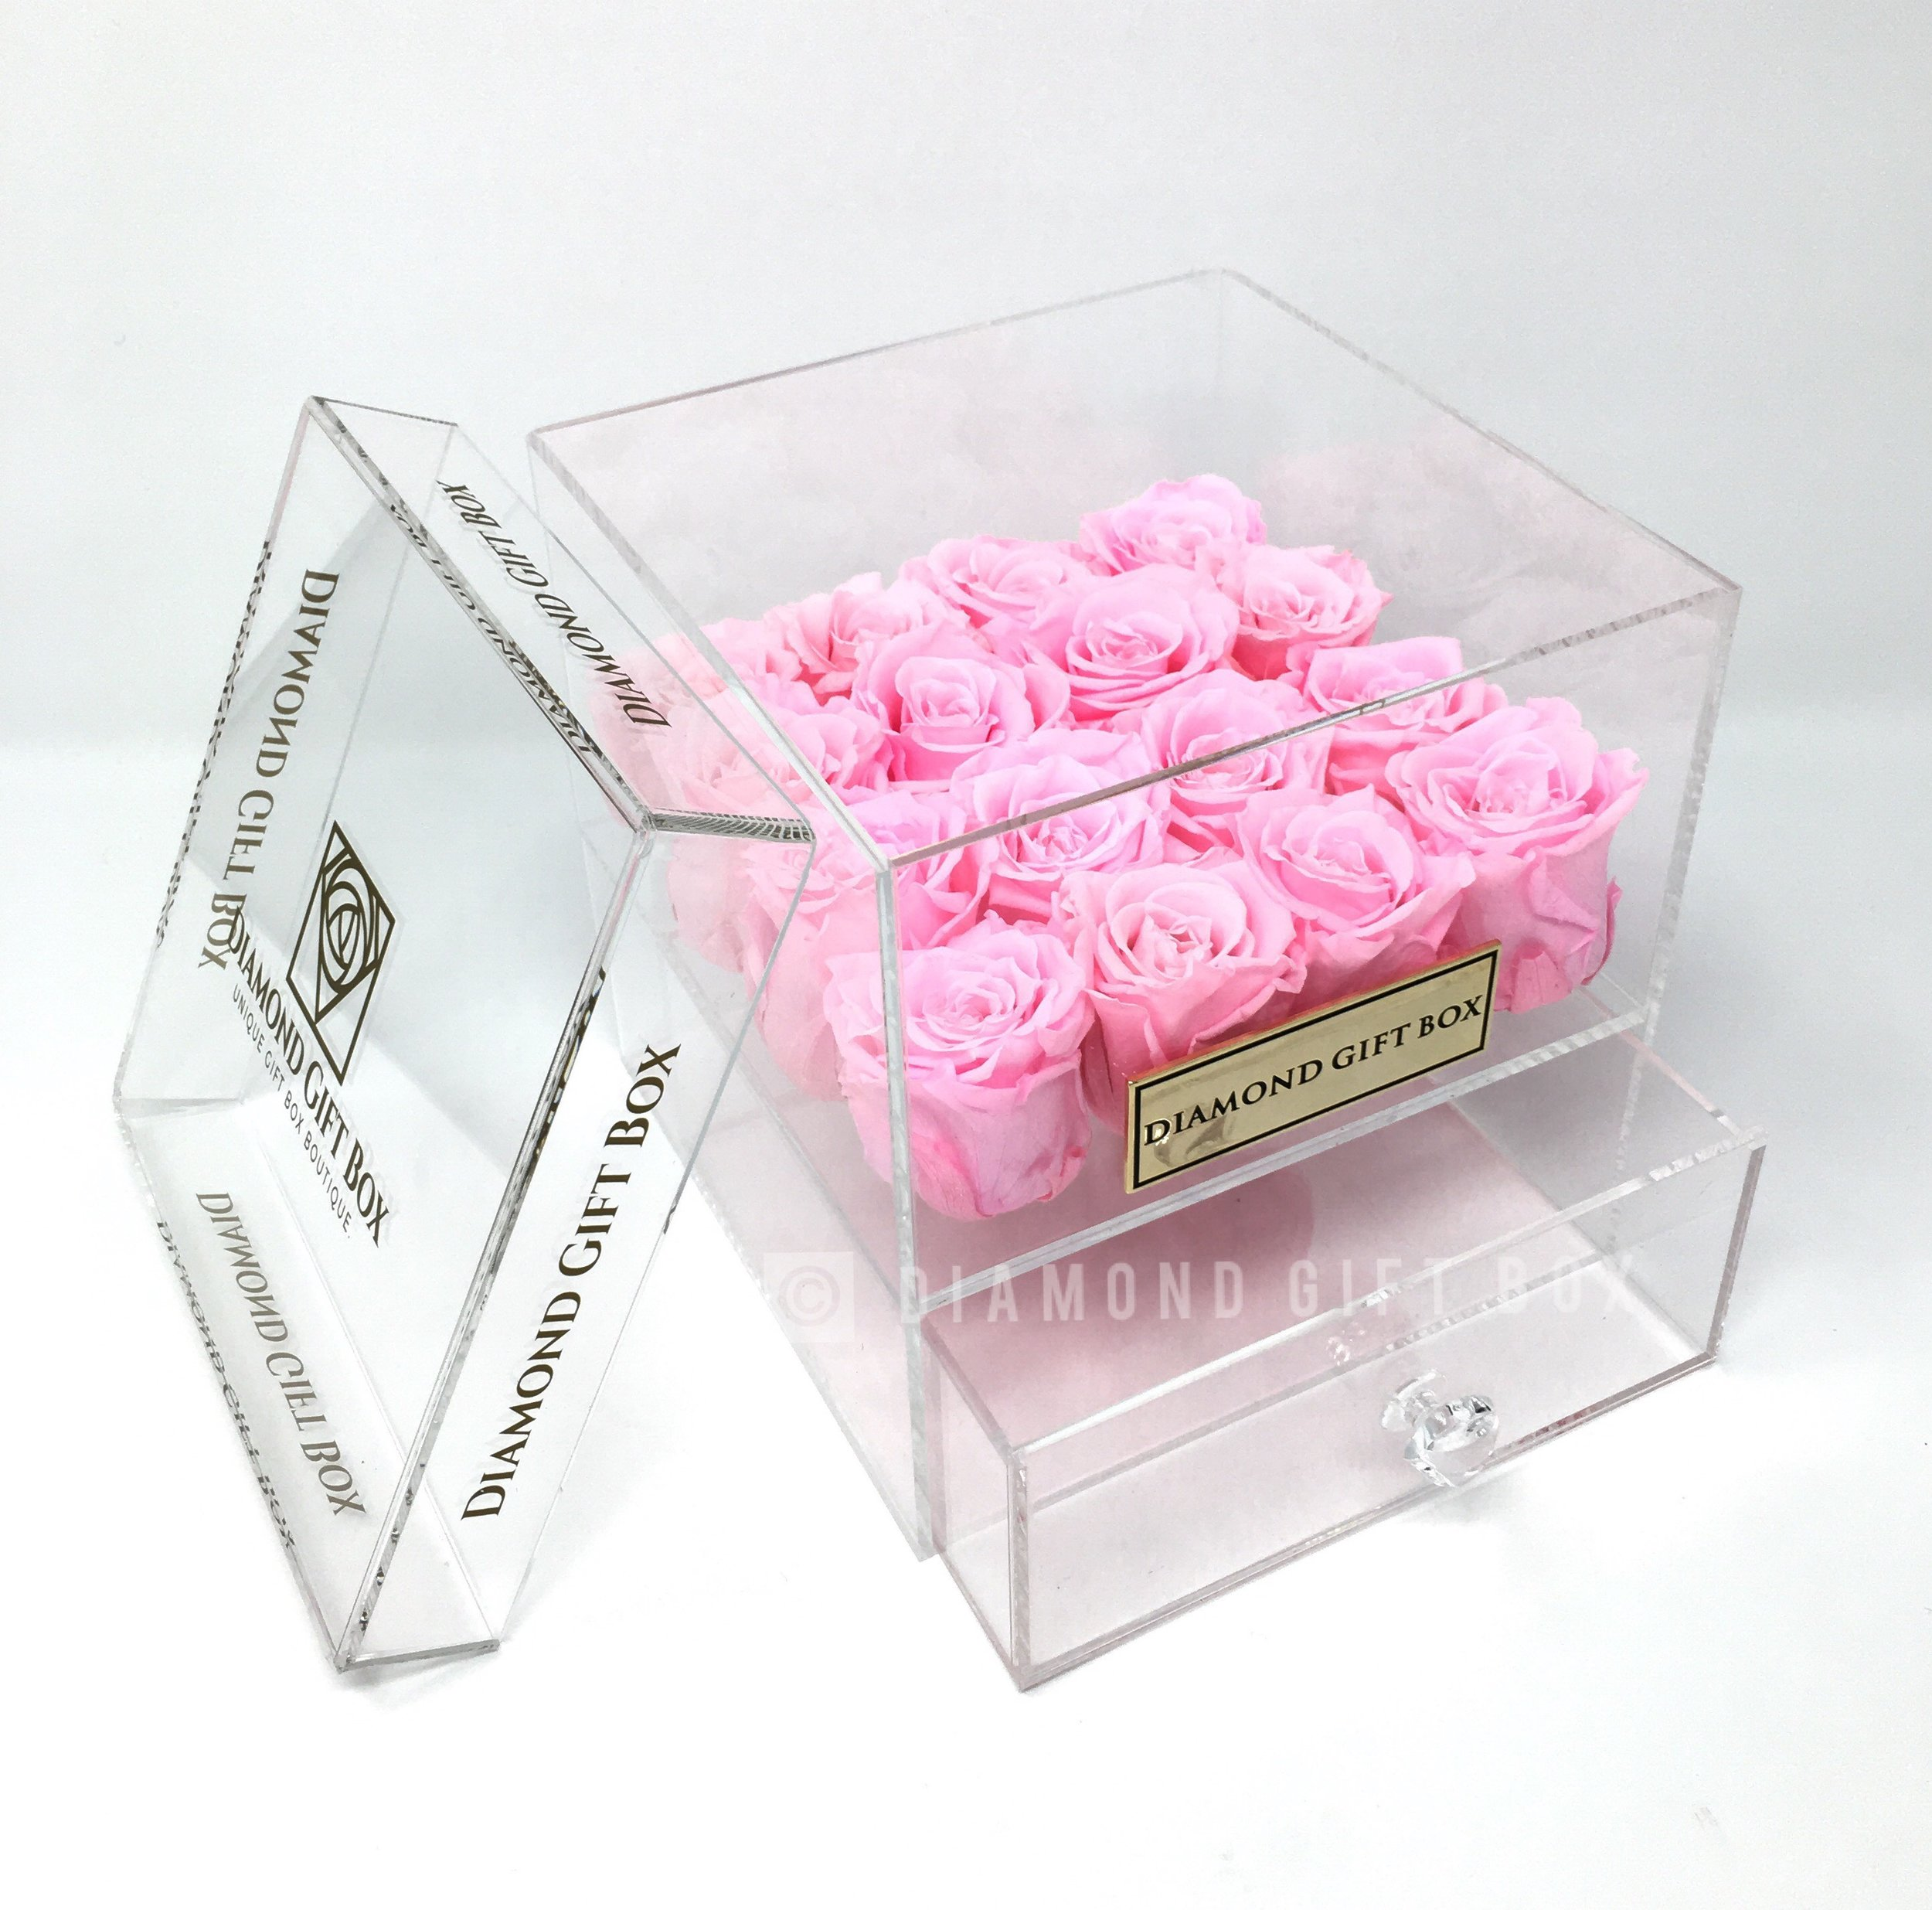 Diamond Gift Box-DIAMOND GIFT BOX - 9/16 ROSES - PLAIN COLOR